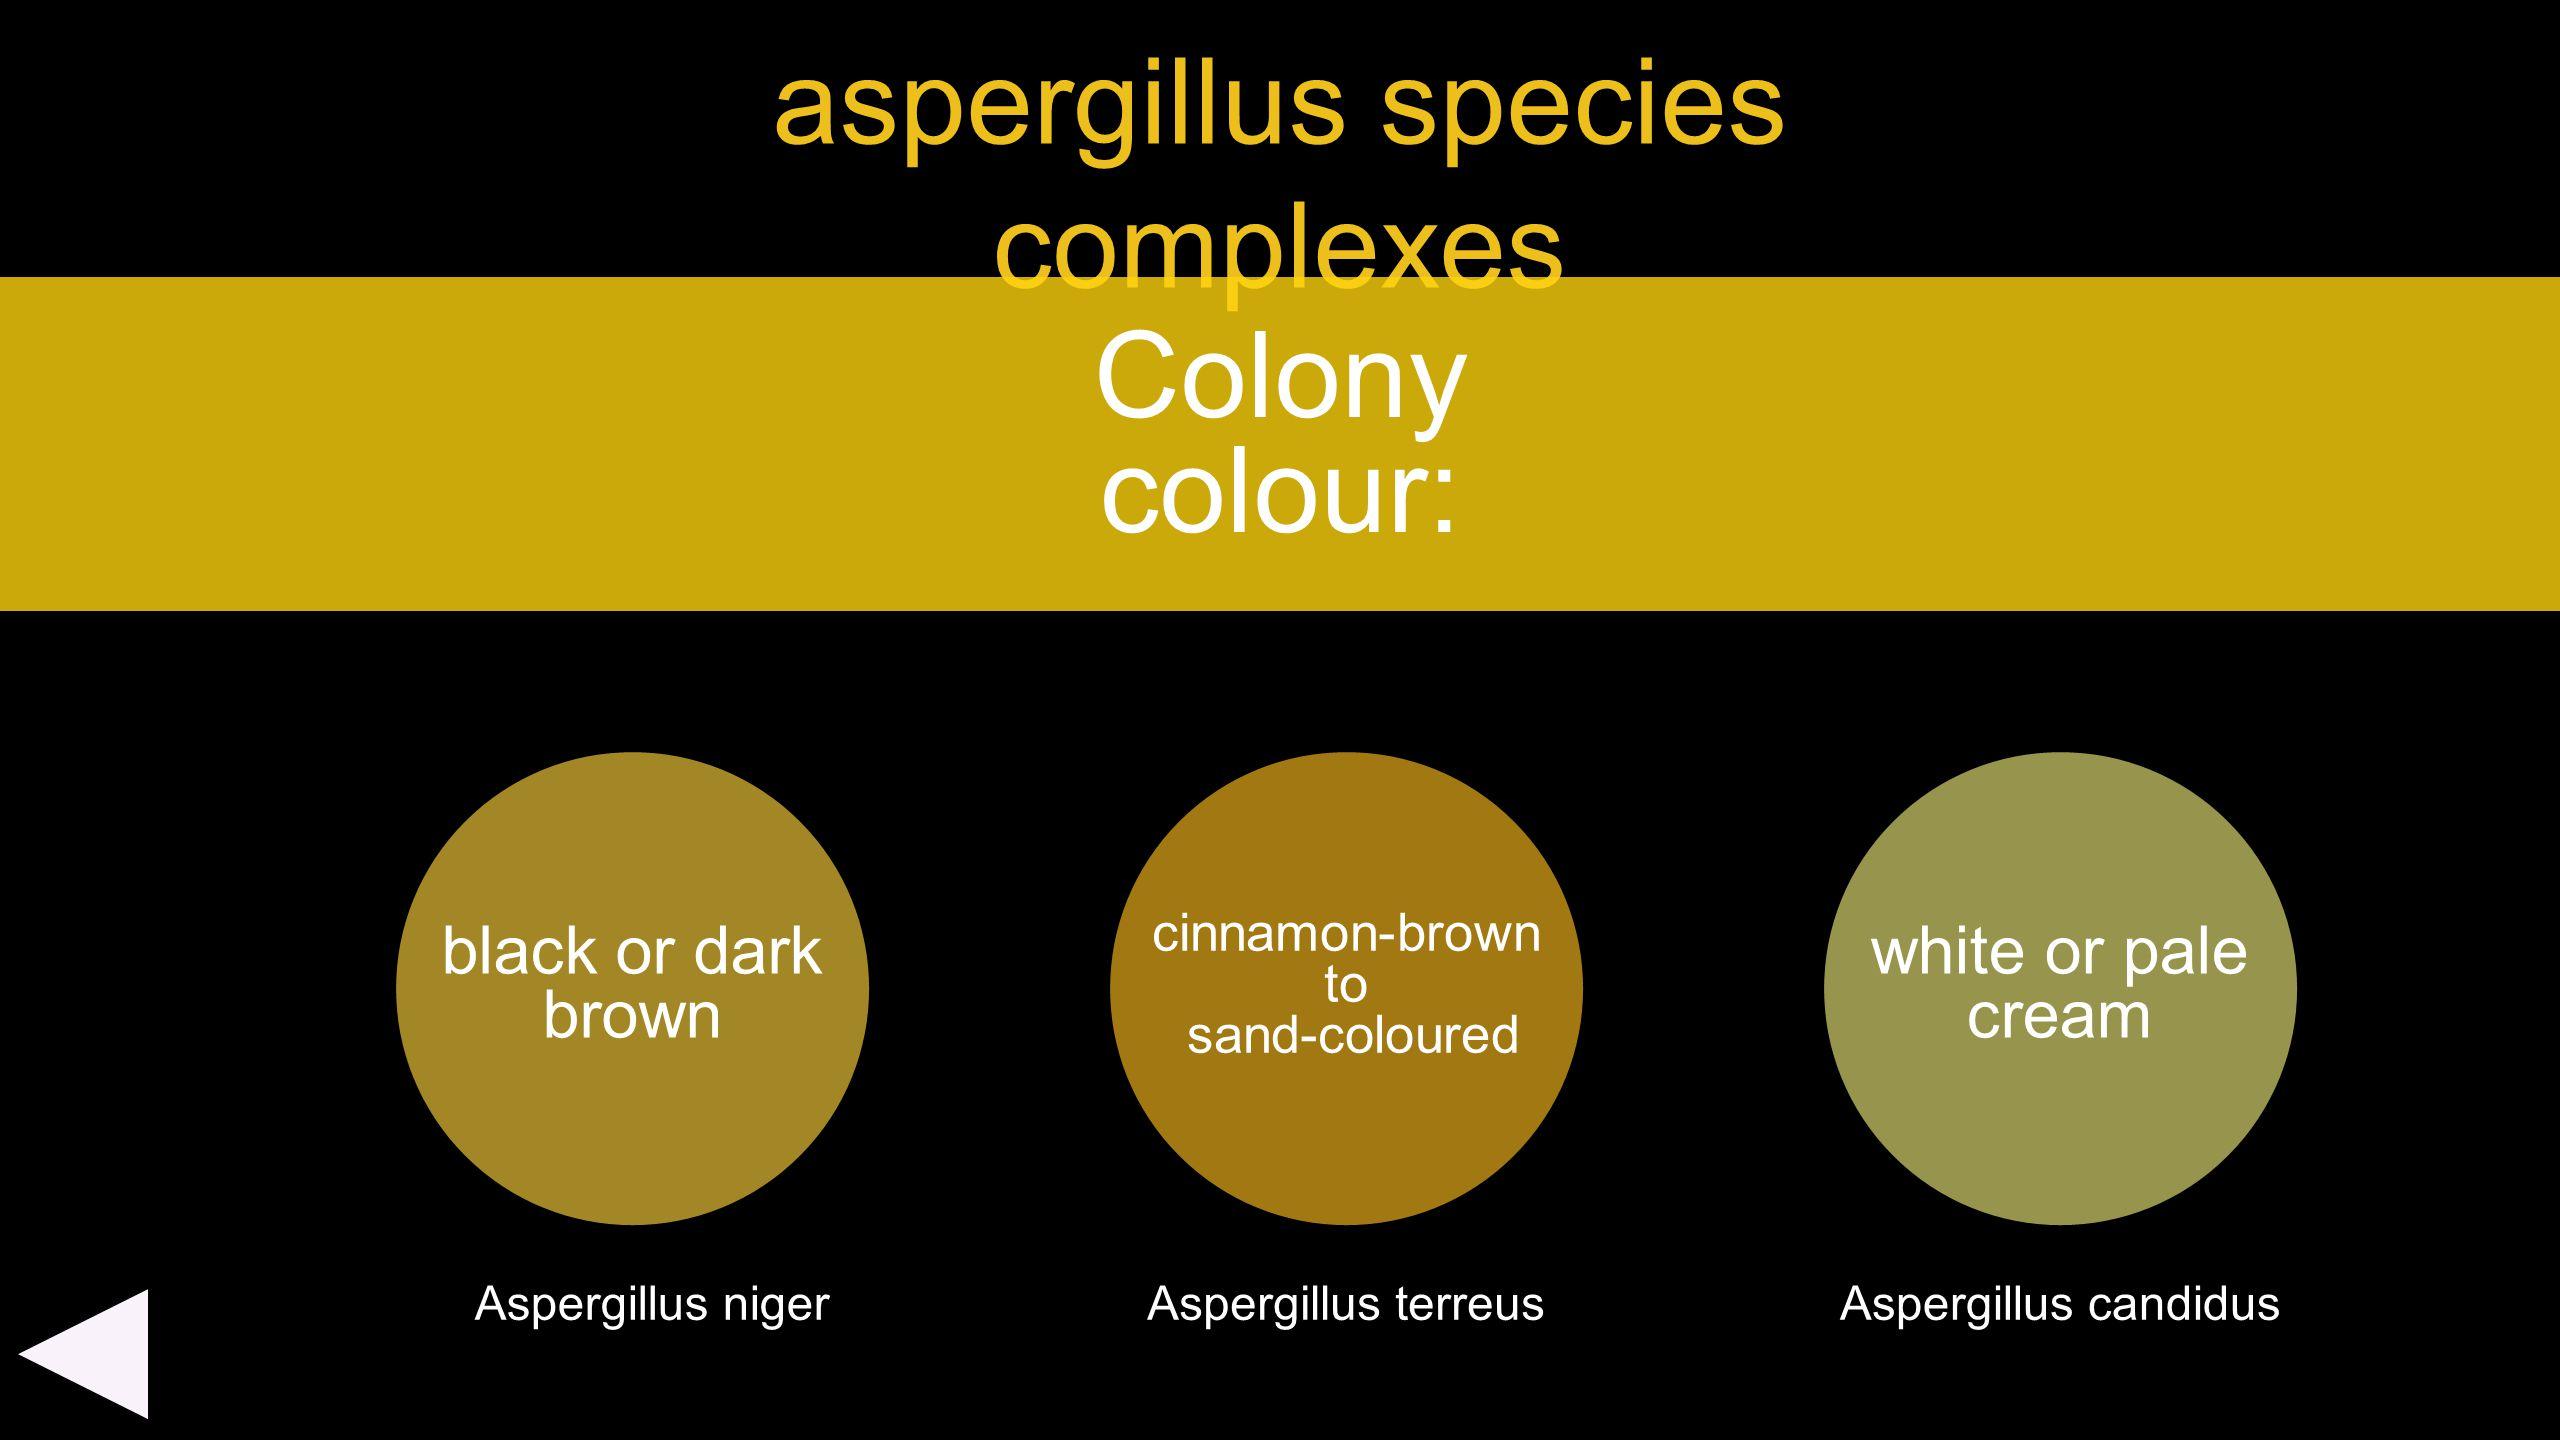 aspergillus species complexes black or dark brown Colony colour: cinnamon-brown to sand-coloured Aspergillus niger white or pale cream Aspergillus ter